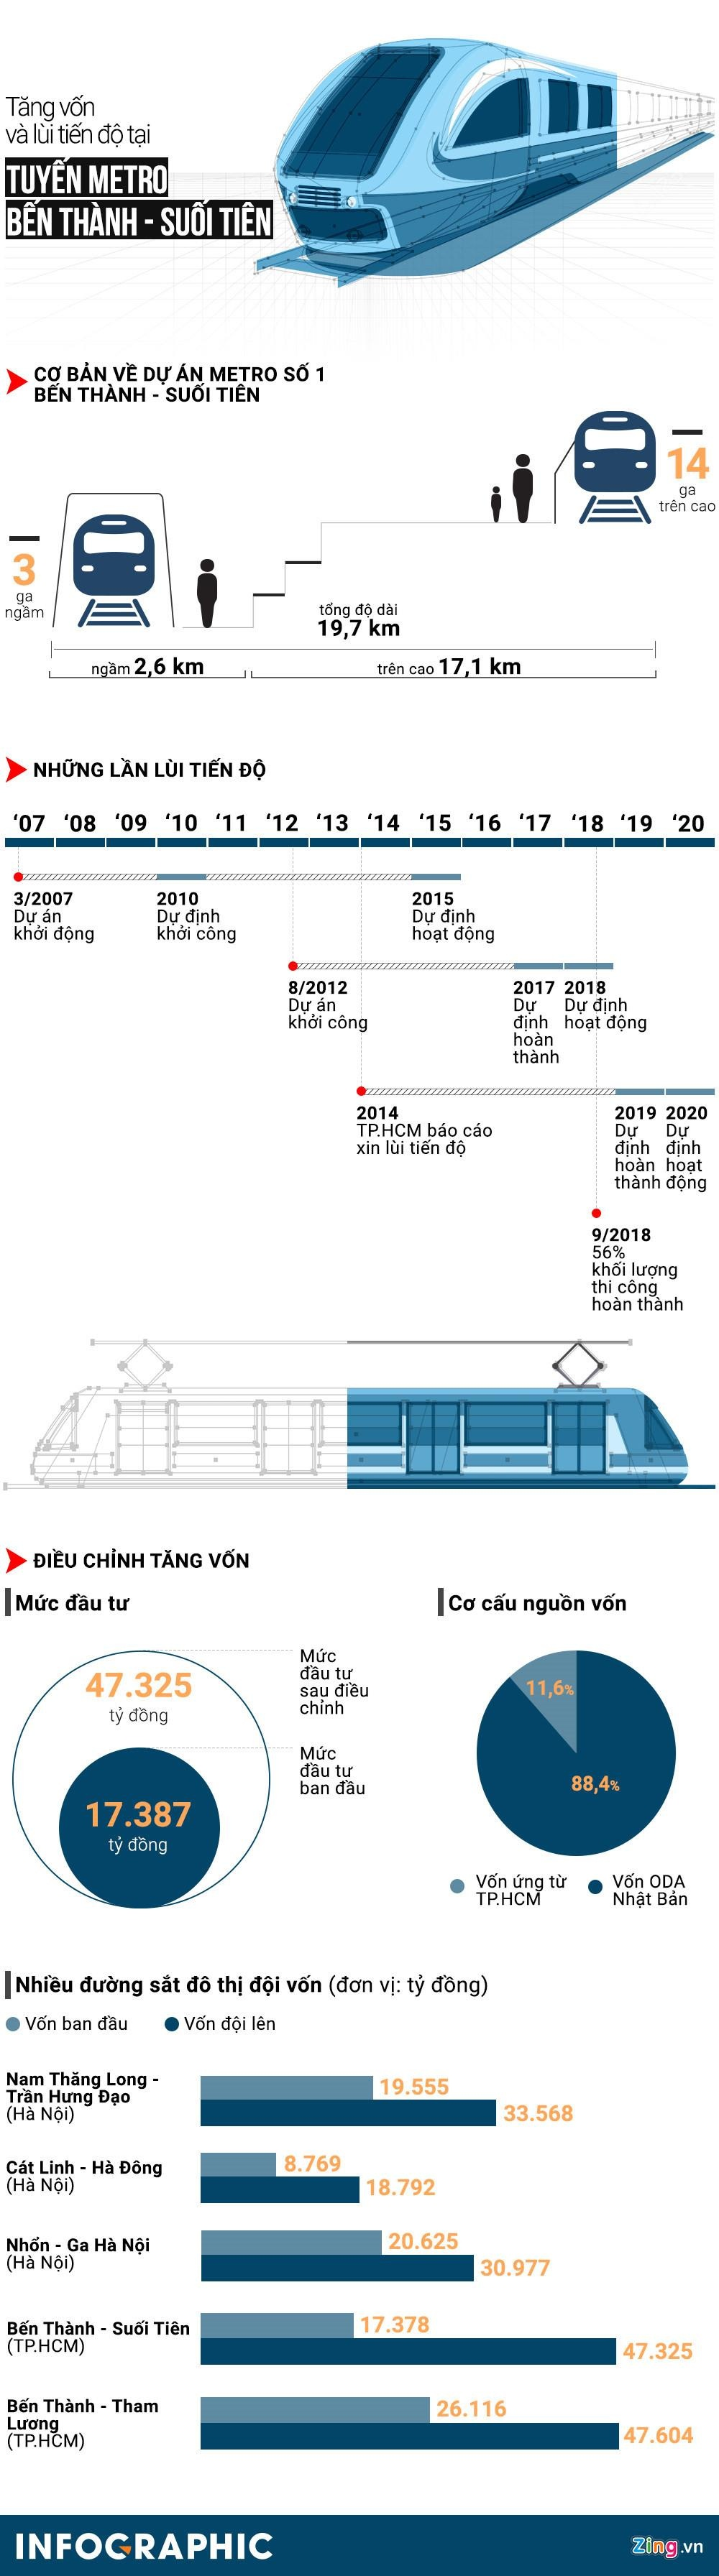 Sut lun ngay doan tuong vay metro duoc dieu chinh tu 2 m xuong 1,5 m hinh anh 4